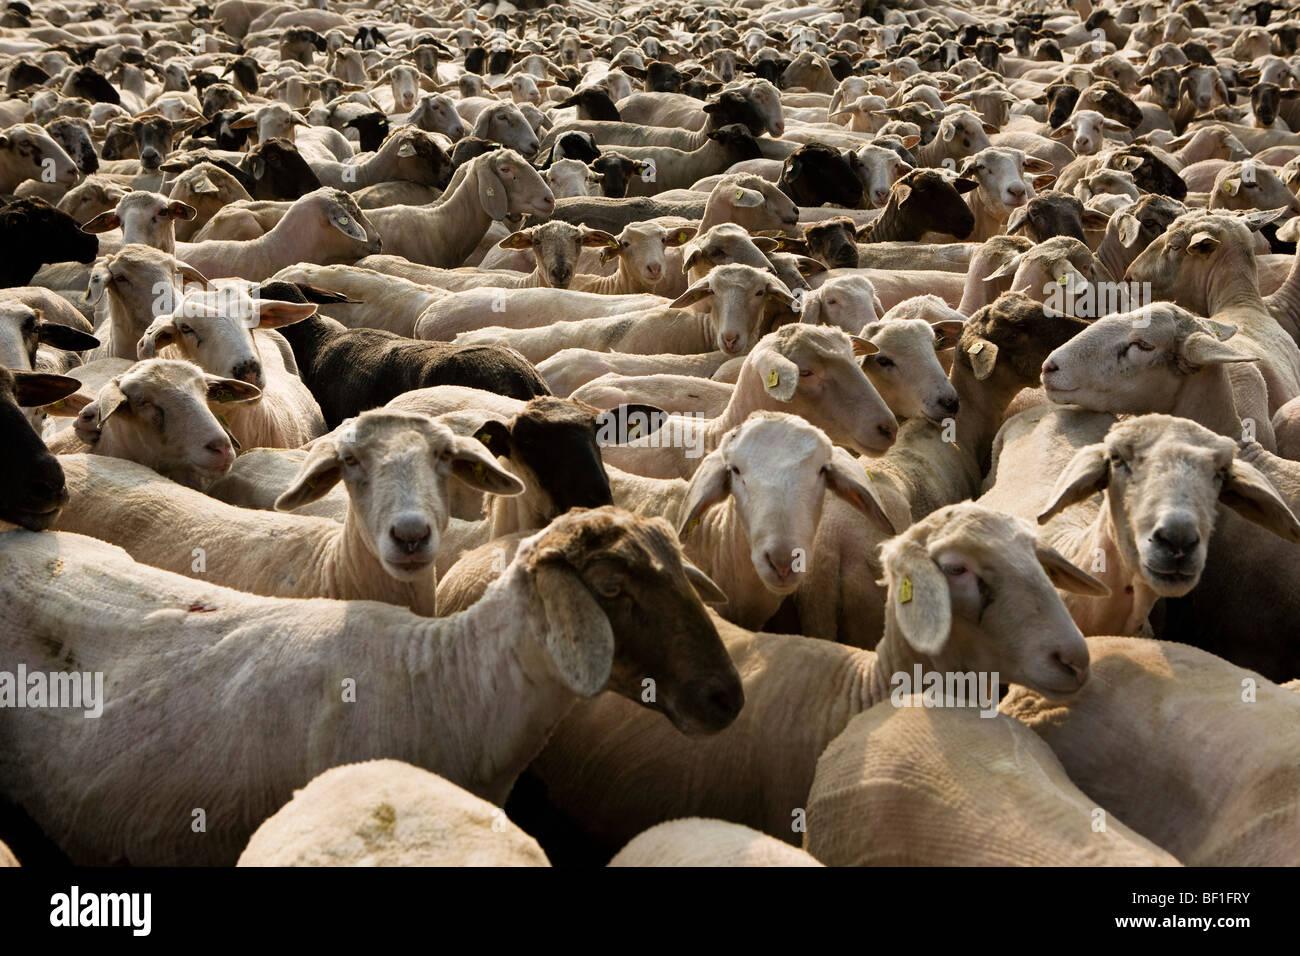 A flock of sheep, full frame - Stock Image